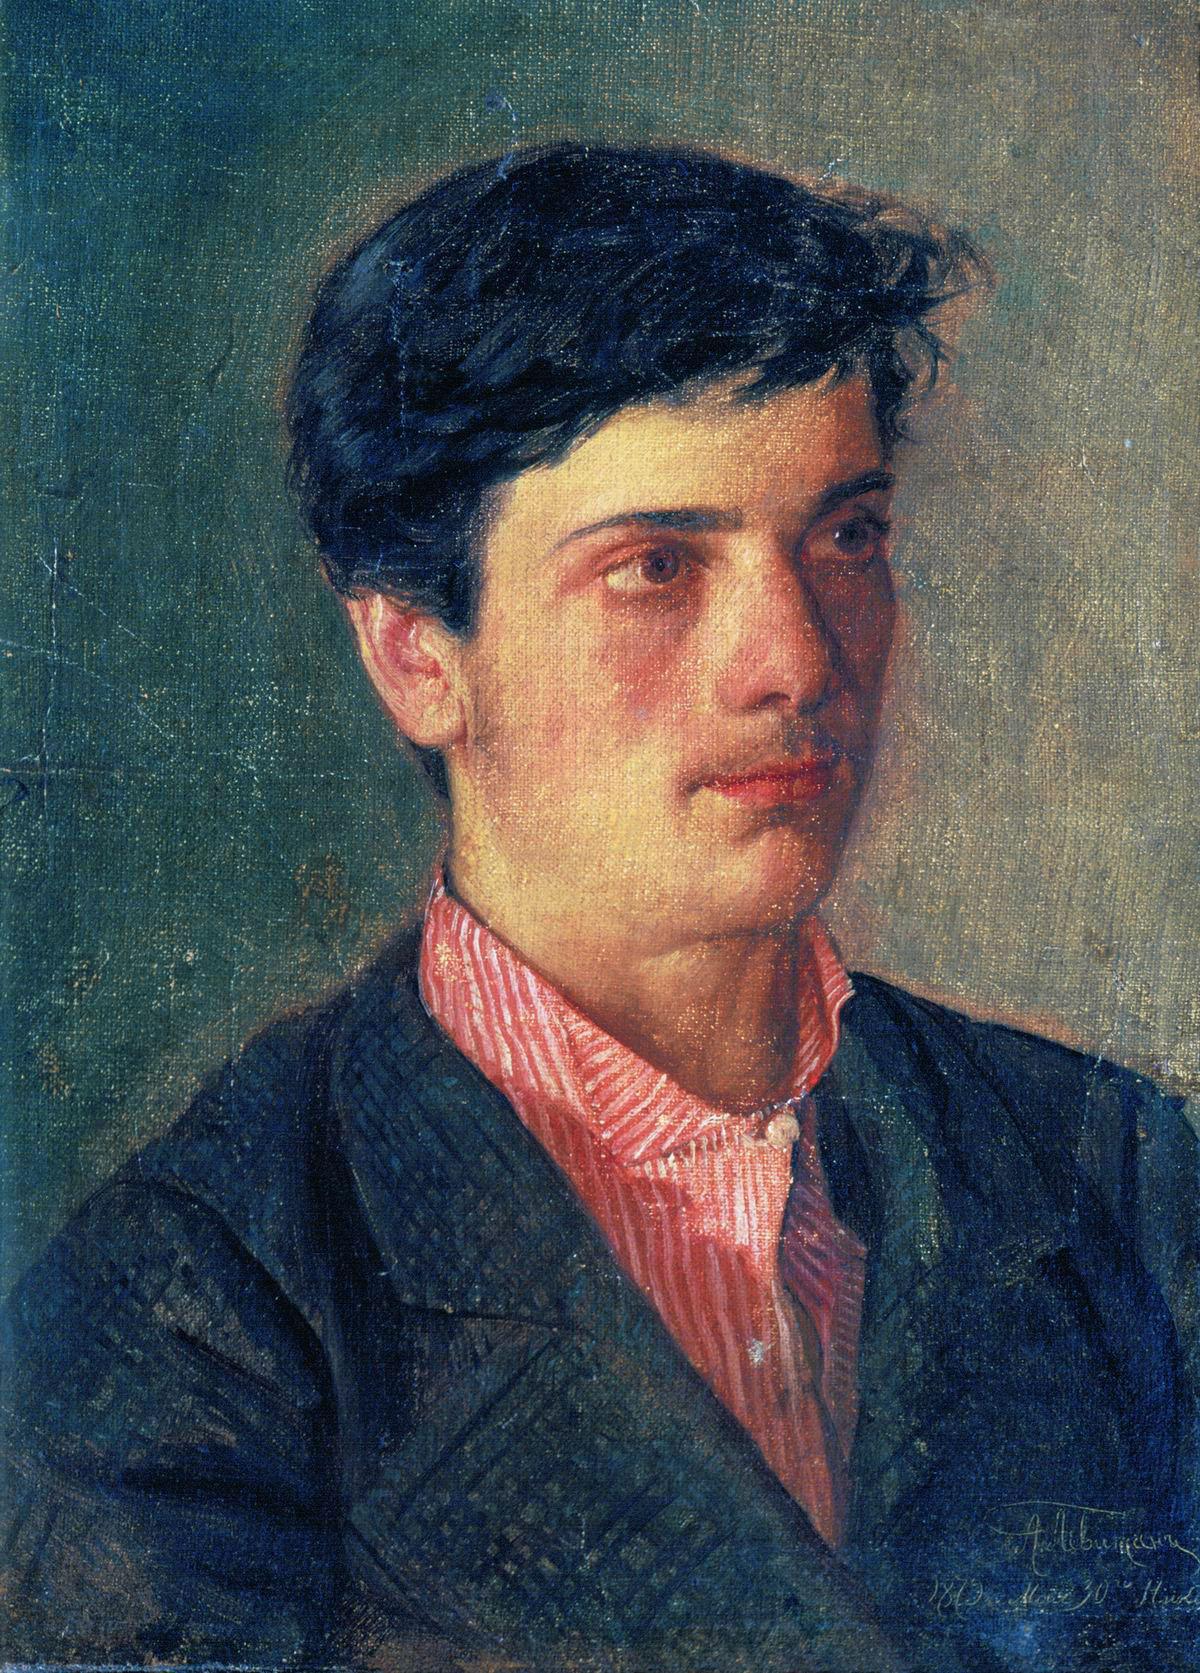 Левитан А.. Портрет И.И.Левитана. 1879